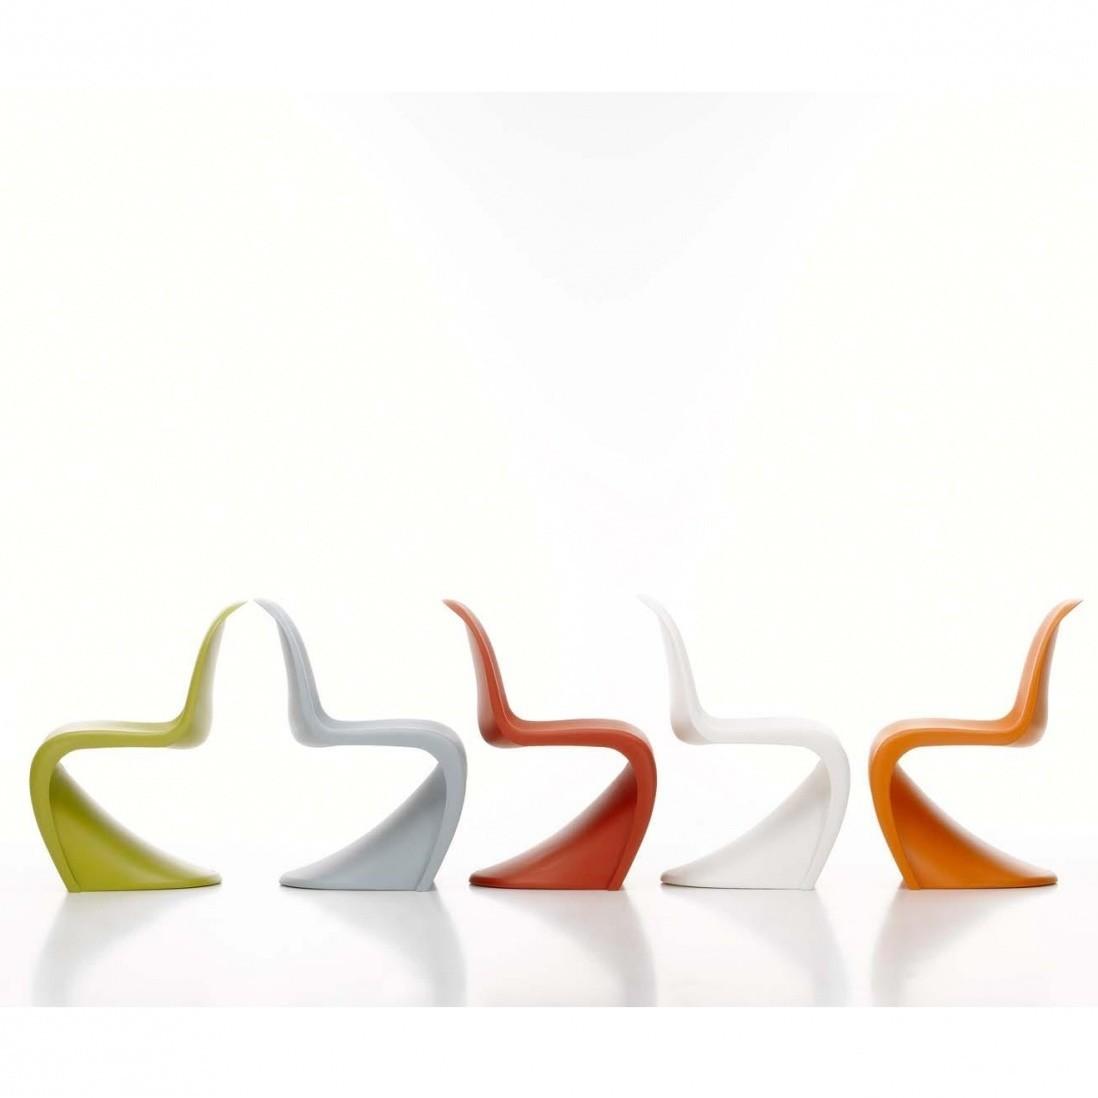 Vitra_Panton-Chair_1098x1098-ID90055-38cbe46510b4fdeaabfe6f0d2dfde93b.jpg